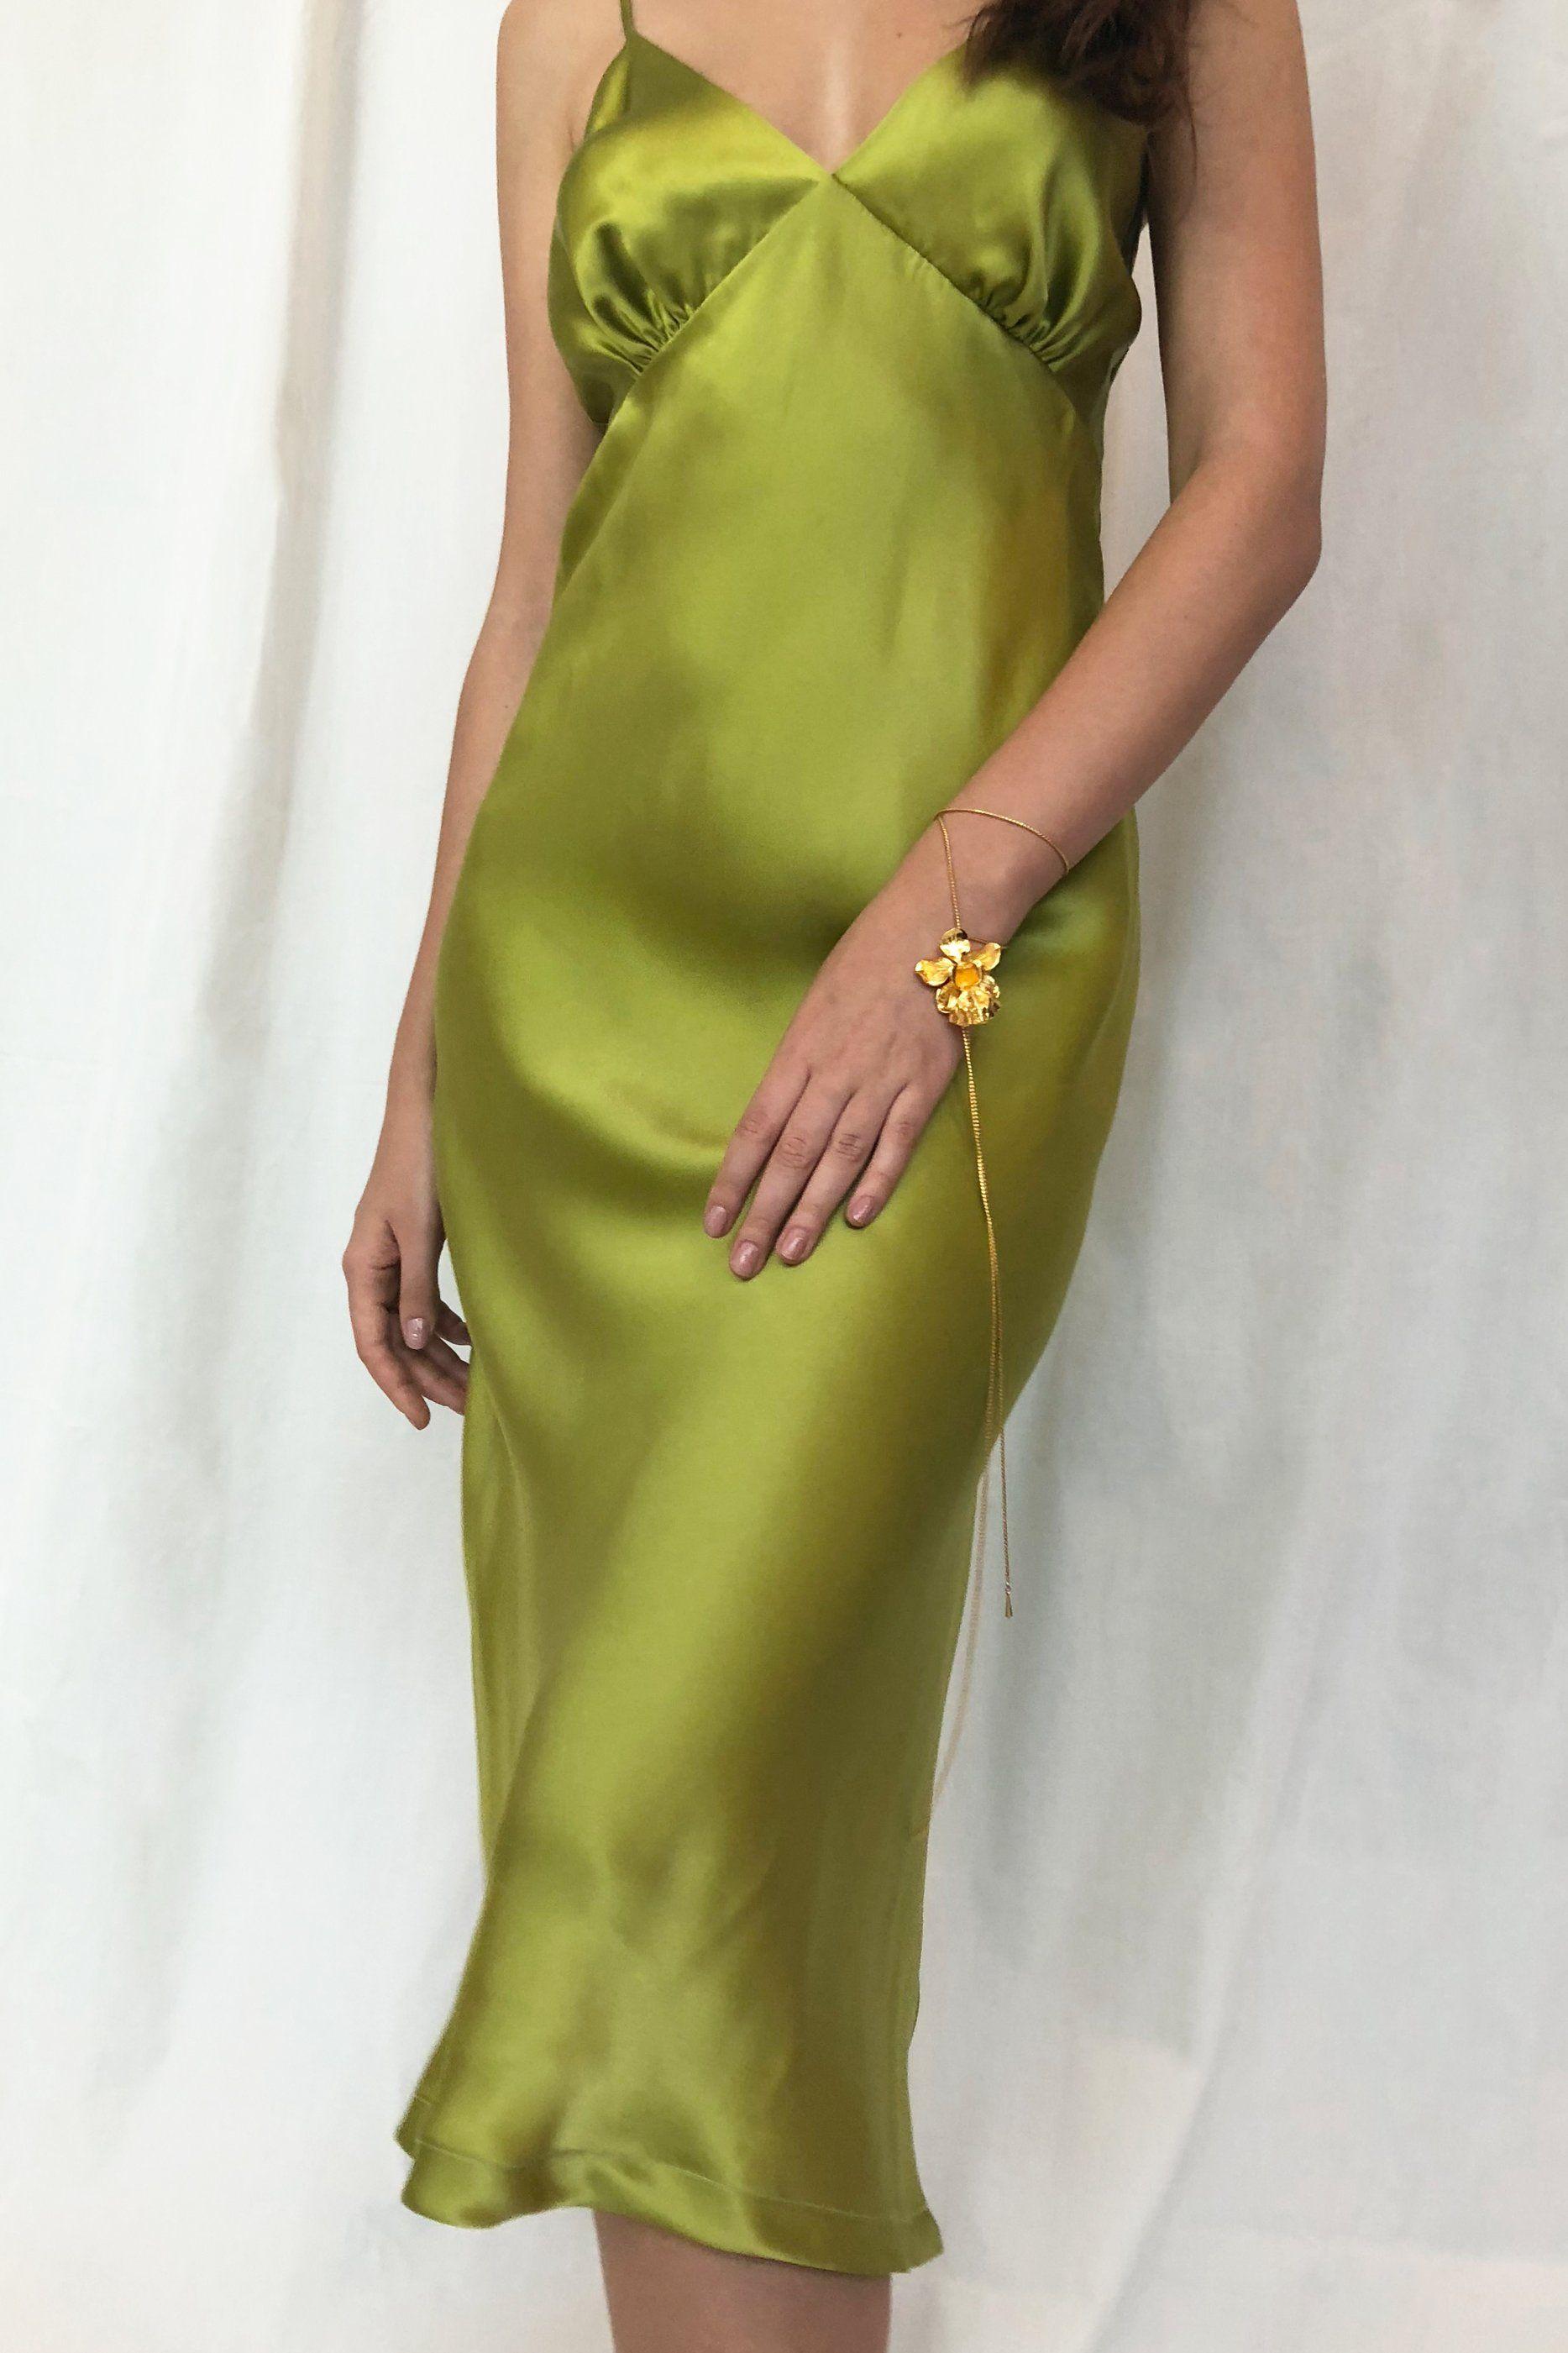 Ms Olive Stolen Stores In 2021 Dresses Silk Slip Dress Slip Dress